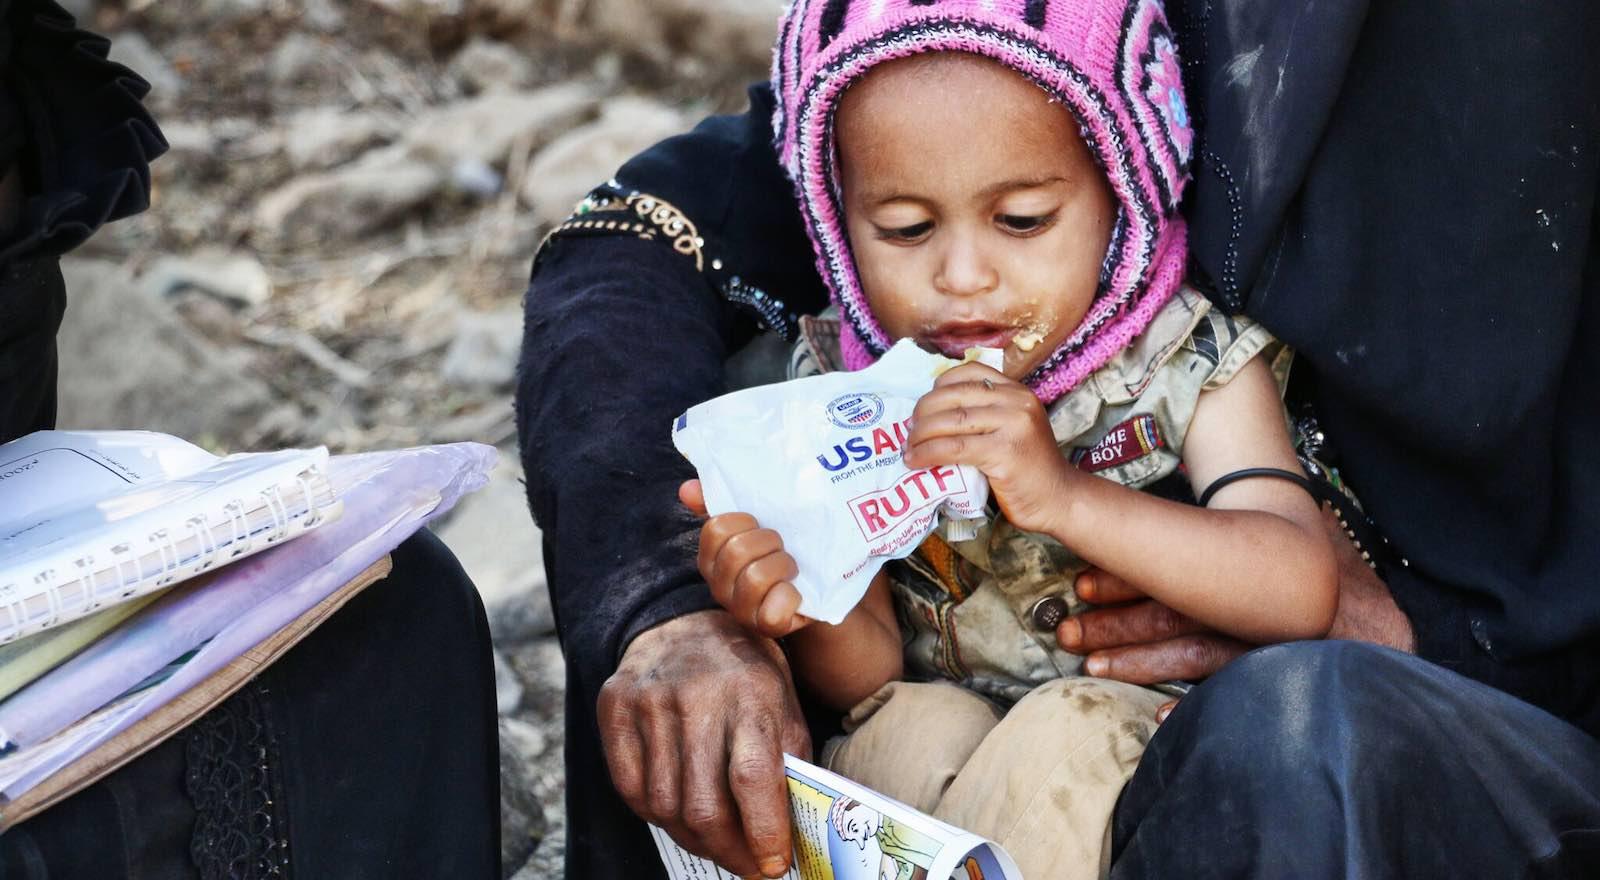 Photo: USAid UNICEF/Flickr